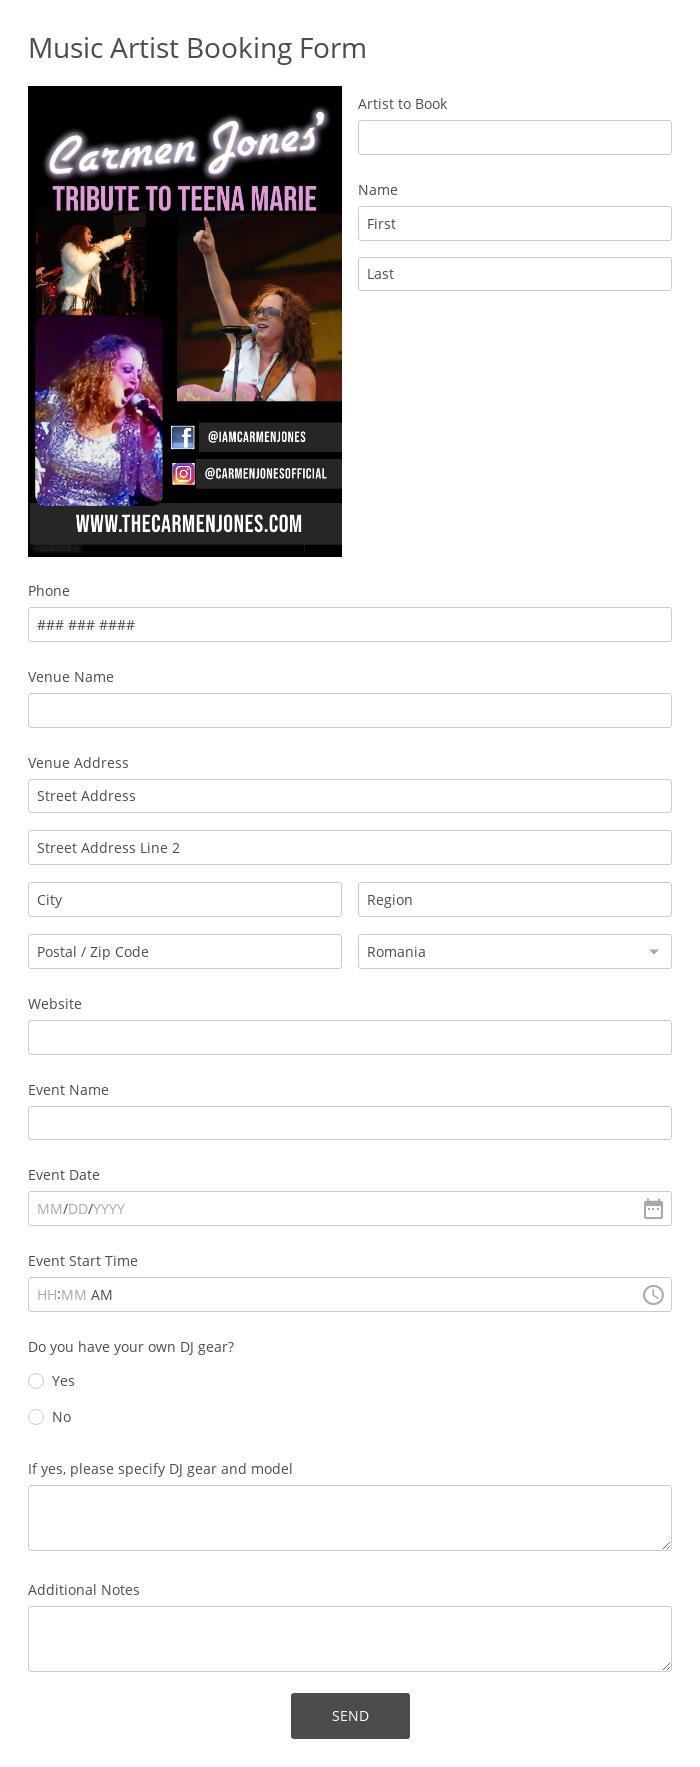 Music Artist Booking Form